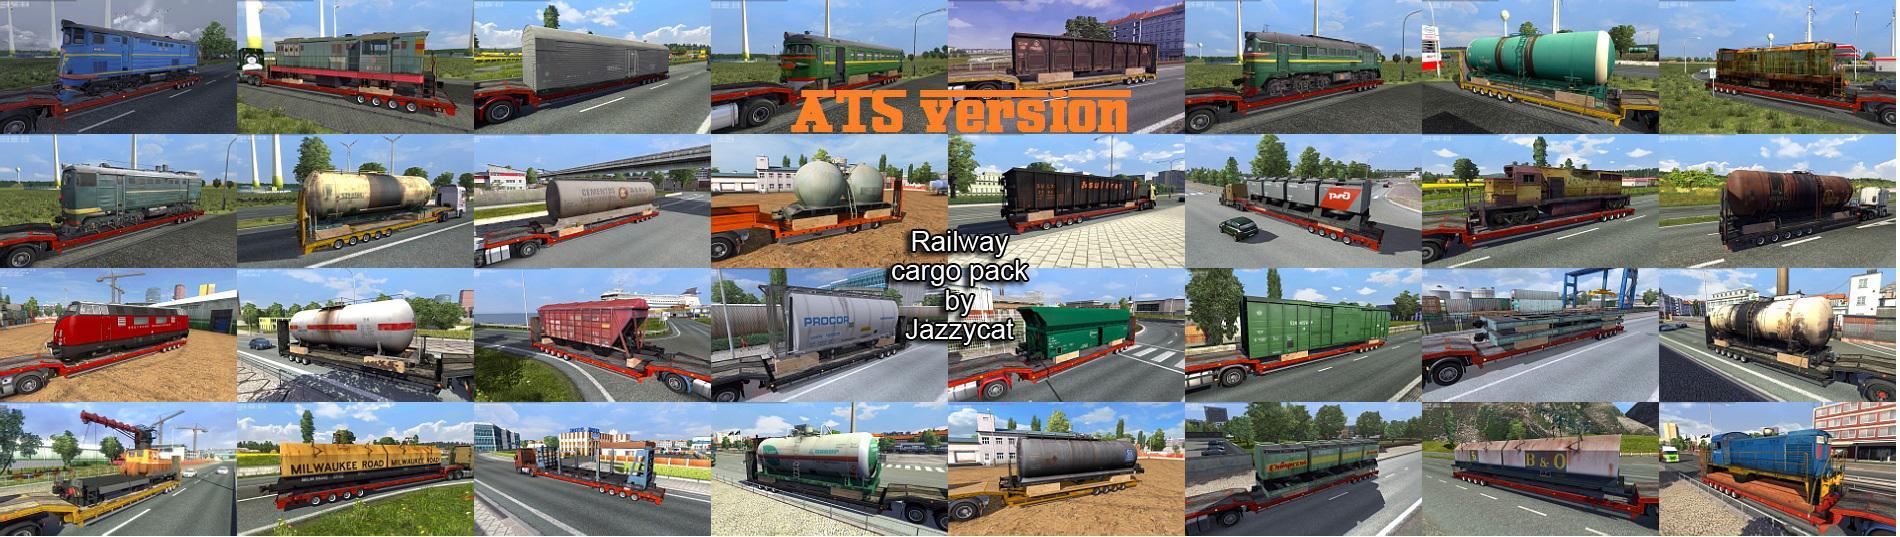 ATS - Railway Cargo Pack V2.0 (1.36.X)